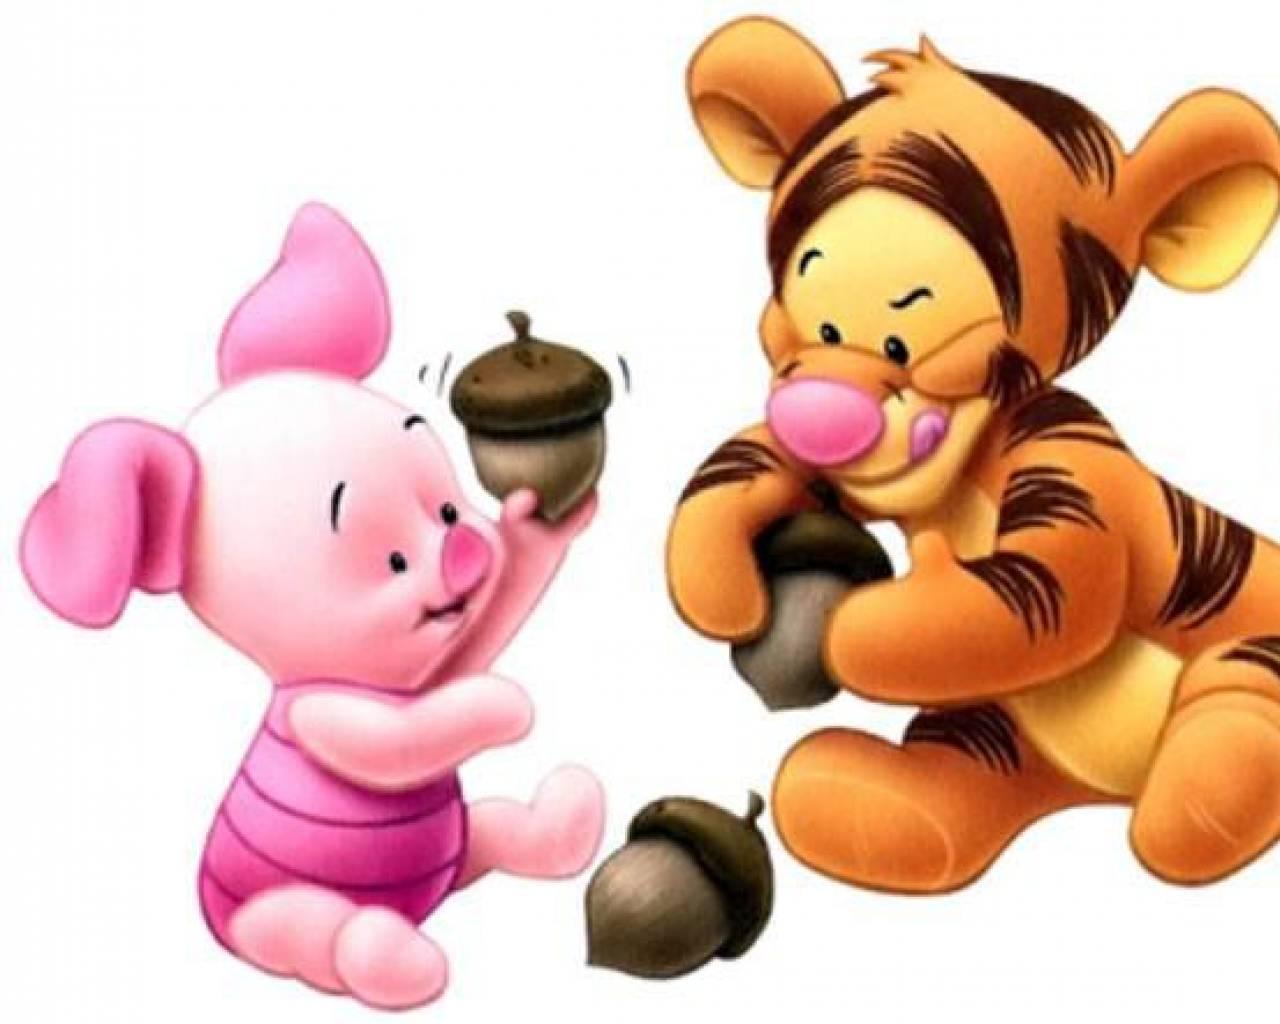 baby Tigger e Piglet 1280x1024 ImagensWikicom 1280x1024